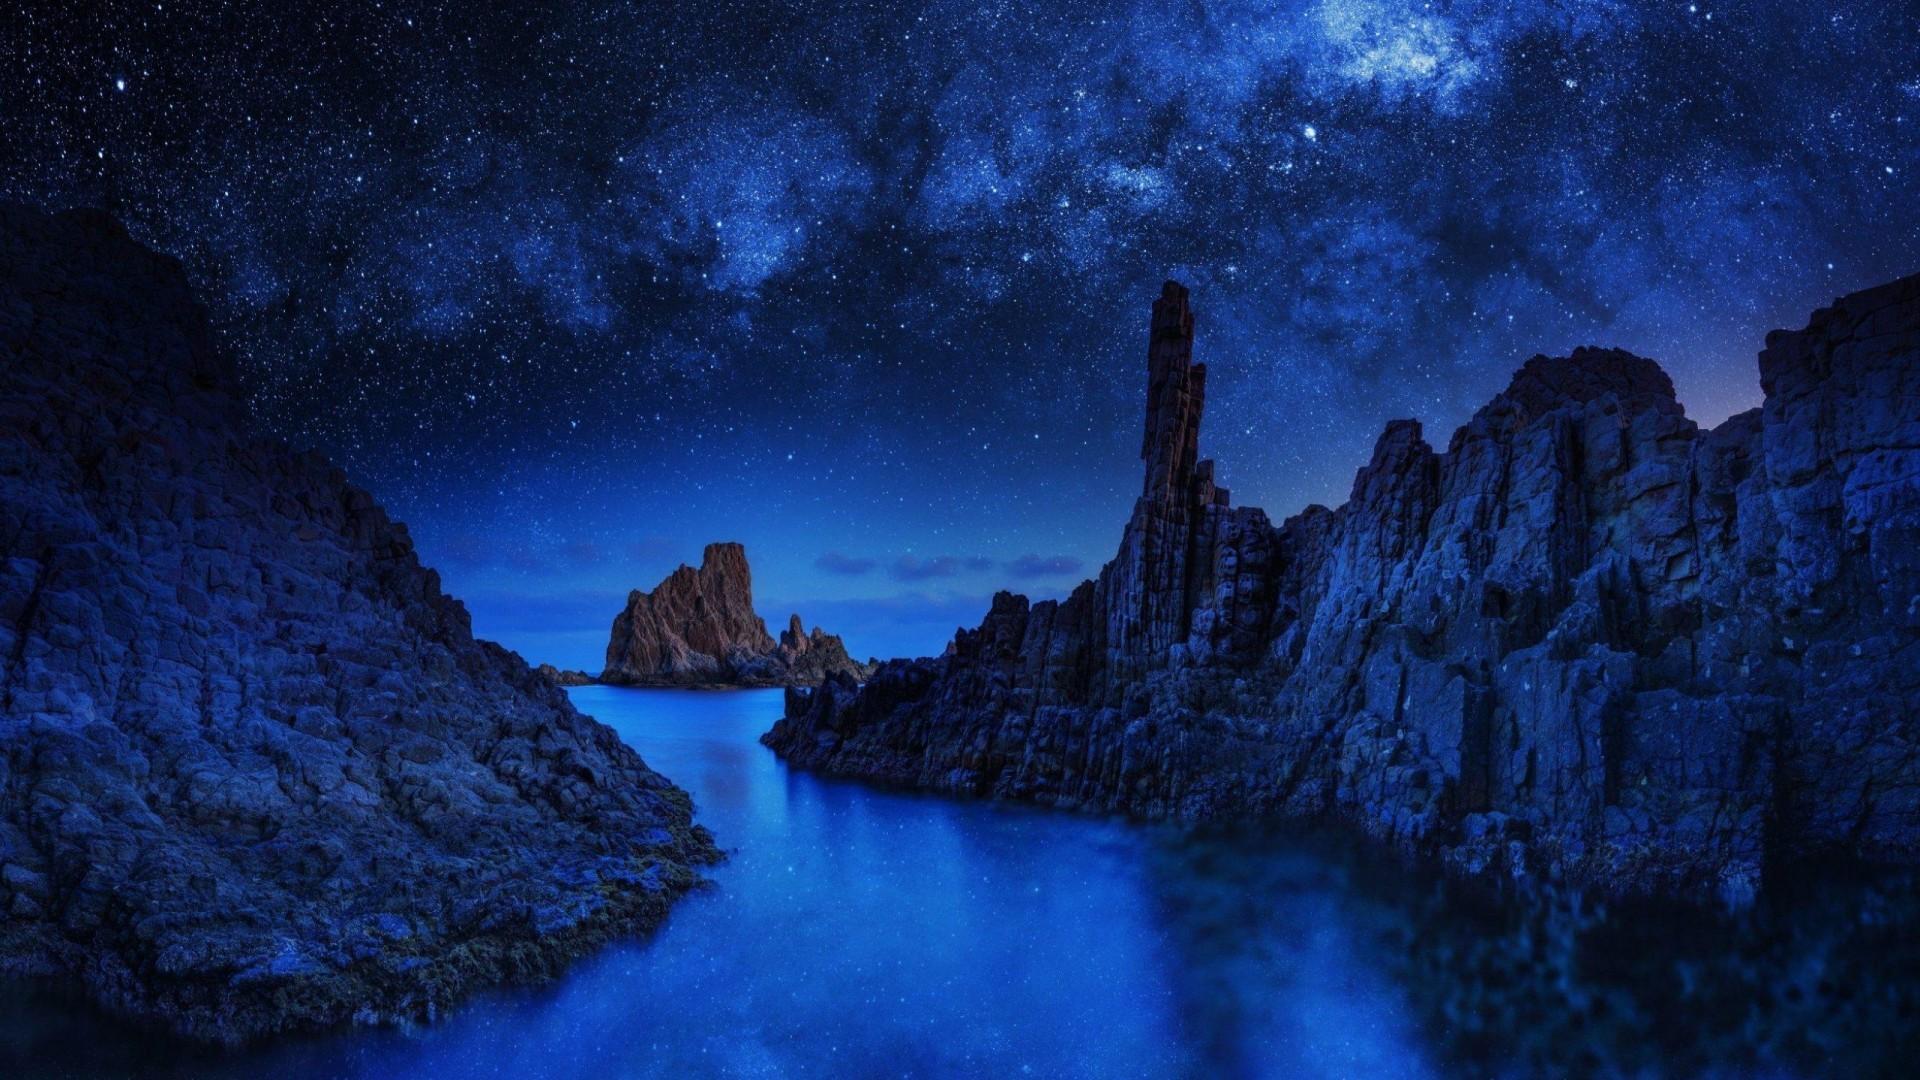 Ocean blue Sea beautiful night wallpaper (1920×1080) Need #iPhone #6S #Plus